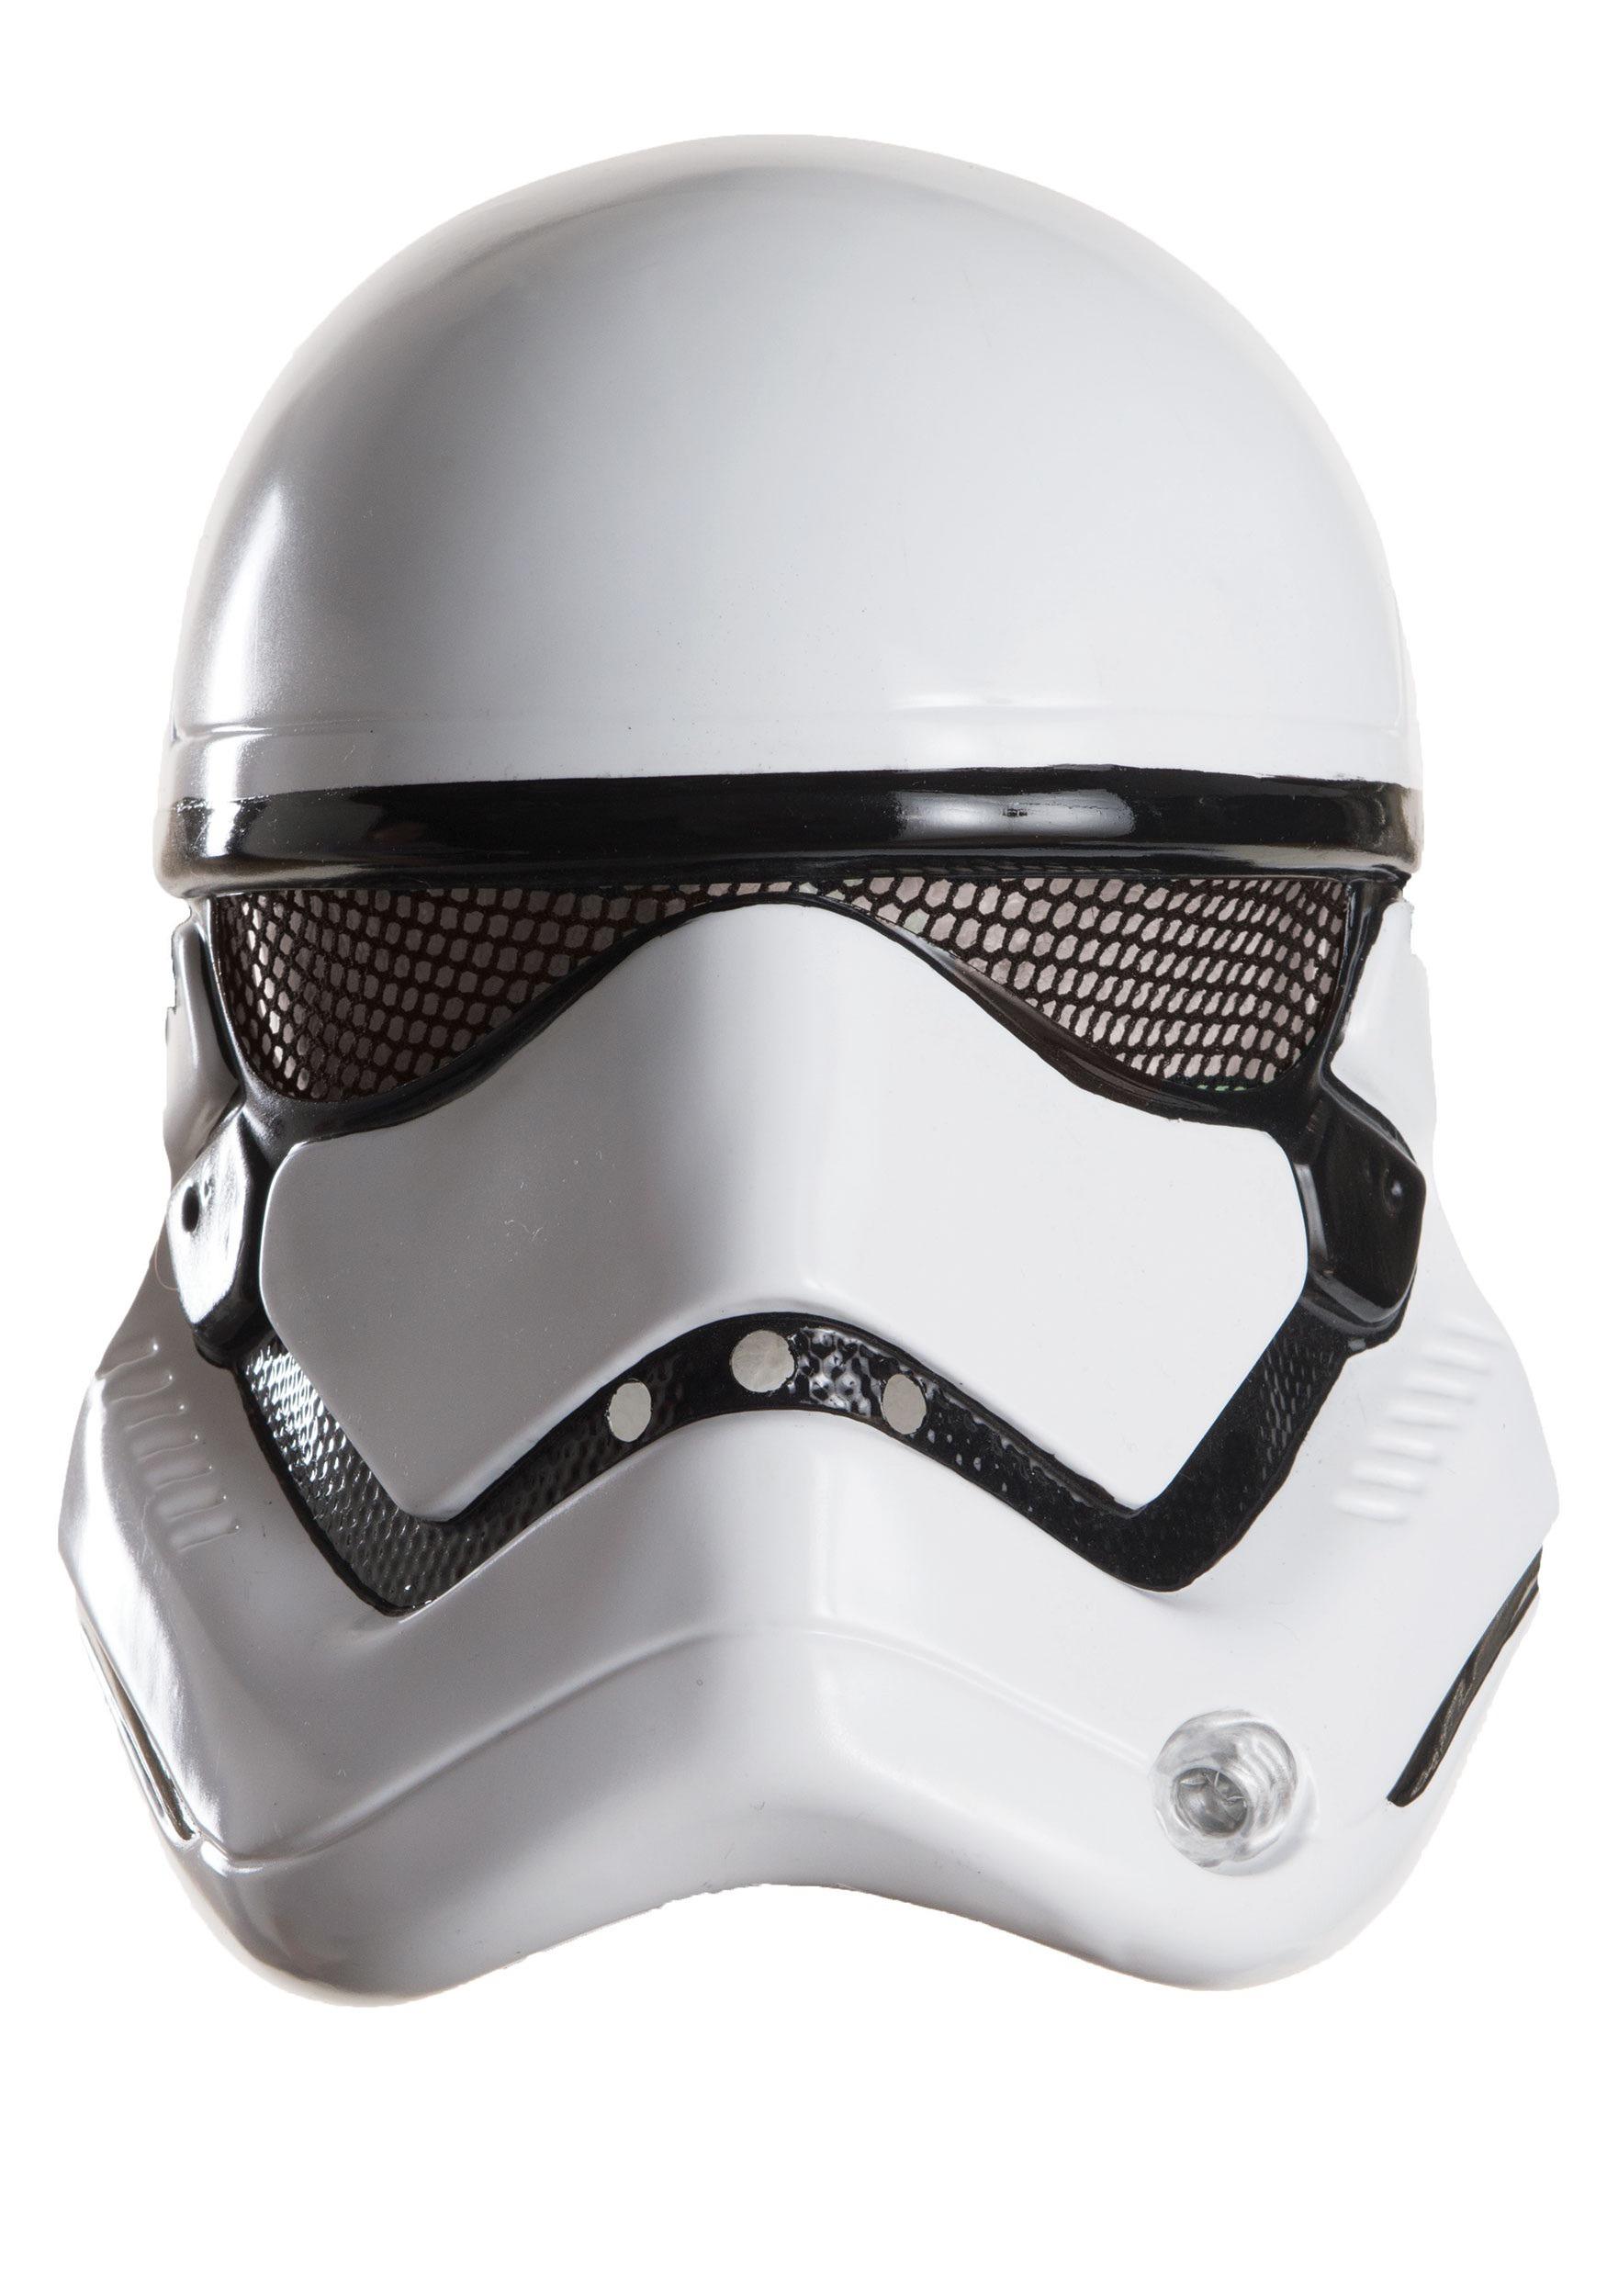 Adult star wars ep 7 stormtrooper 1 2 helmet